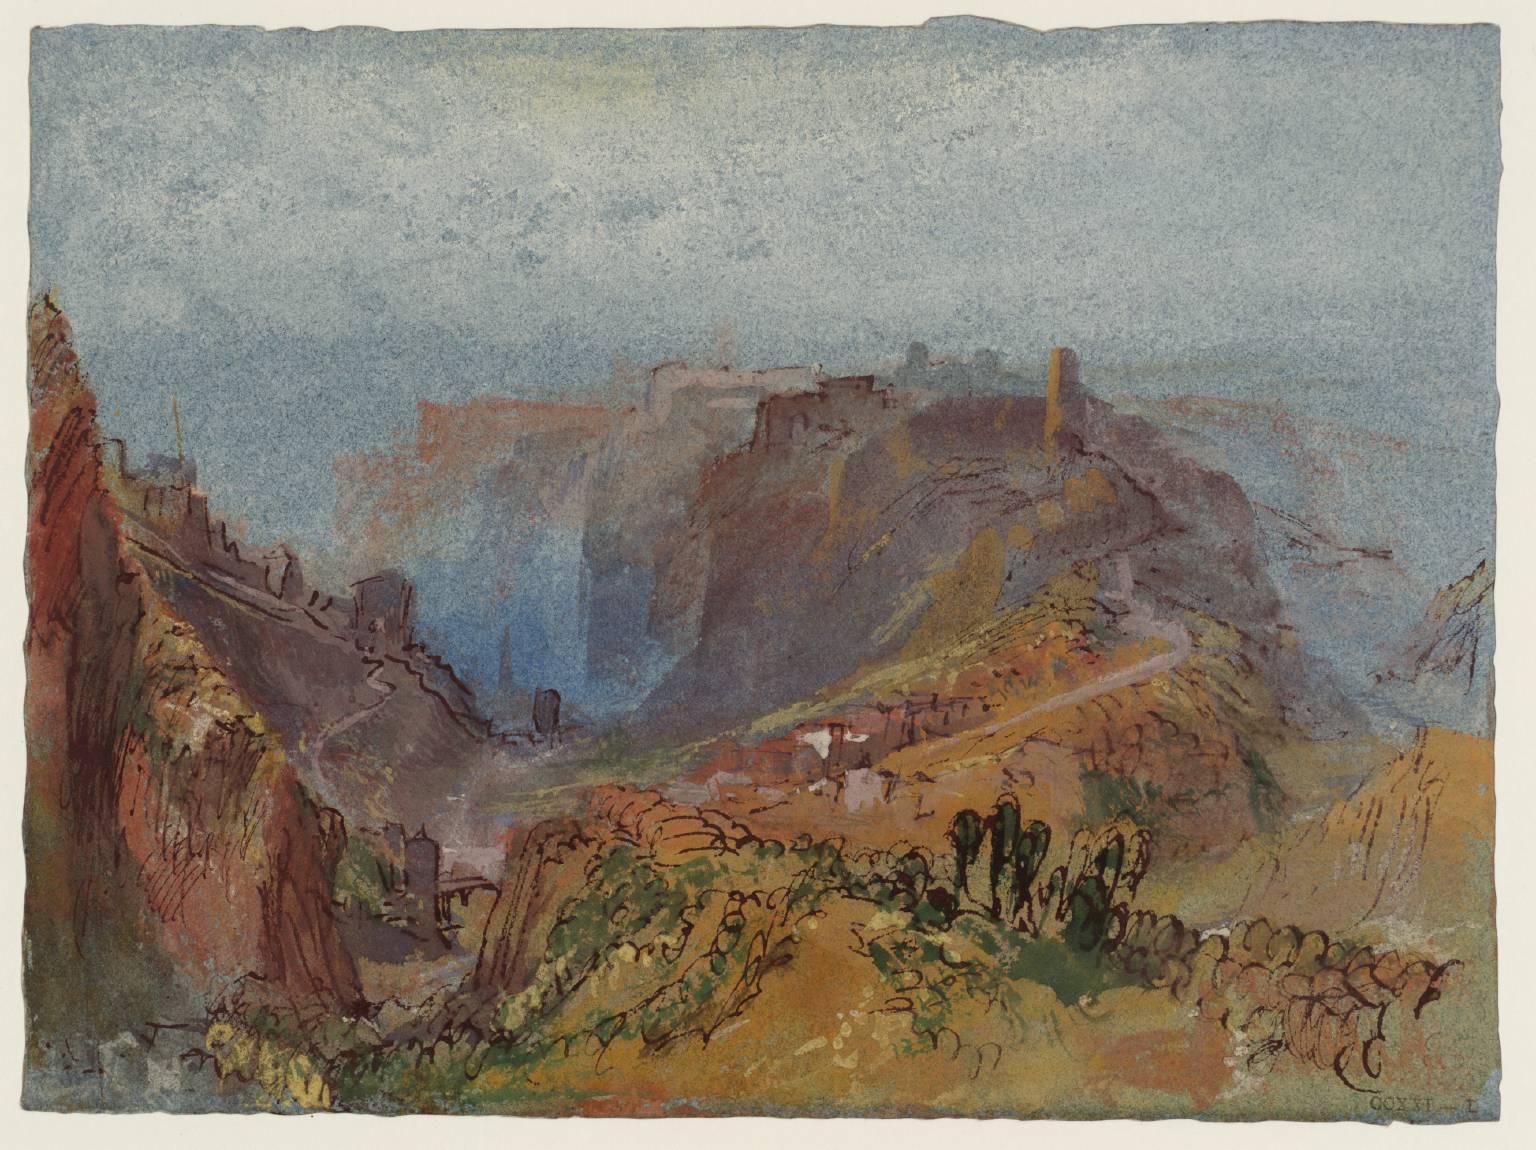 espacialidad-mediante-contraste-William-Turner.Plateau-Bock-Luxemburgo